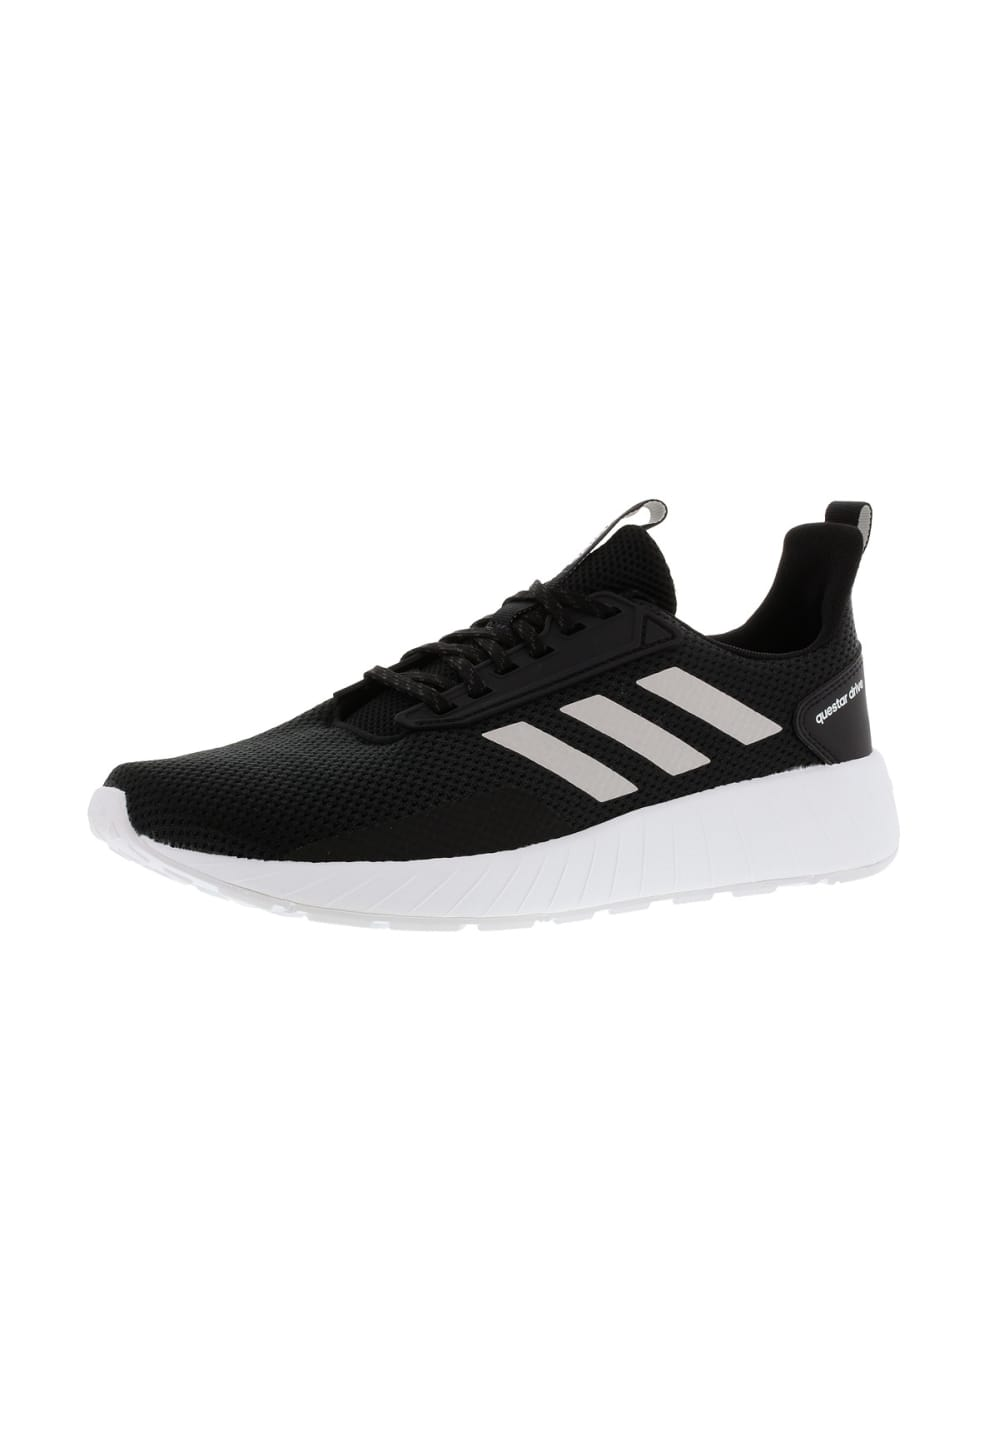 Homme Adidas Pour Running Questar Noir Drive Chaussures xeCrWdoB